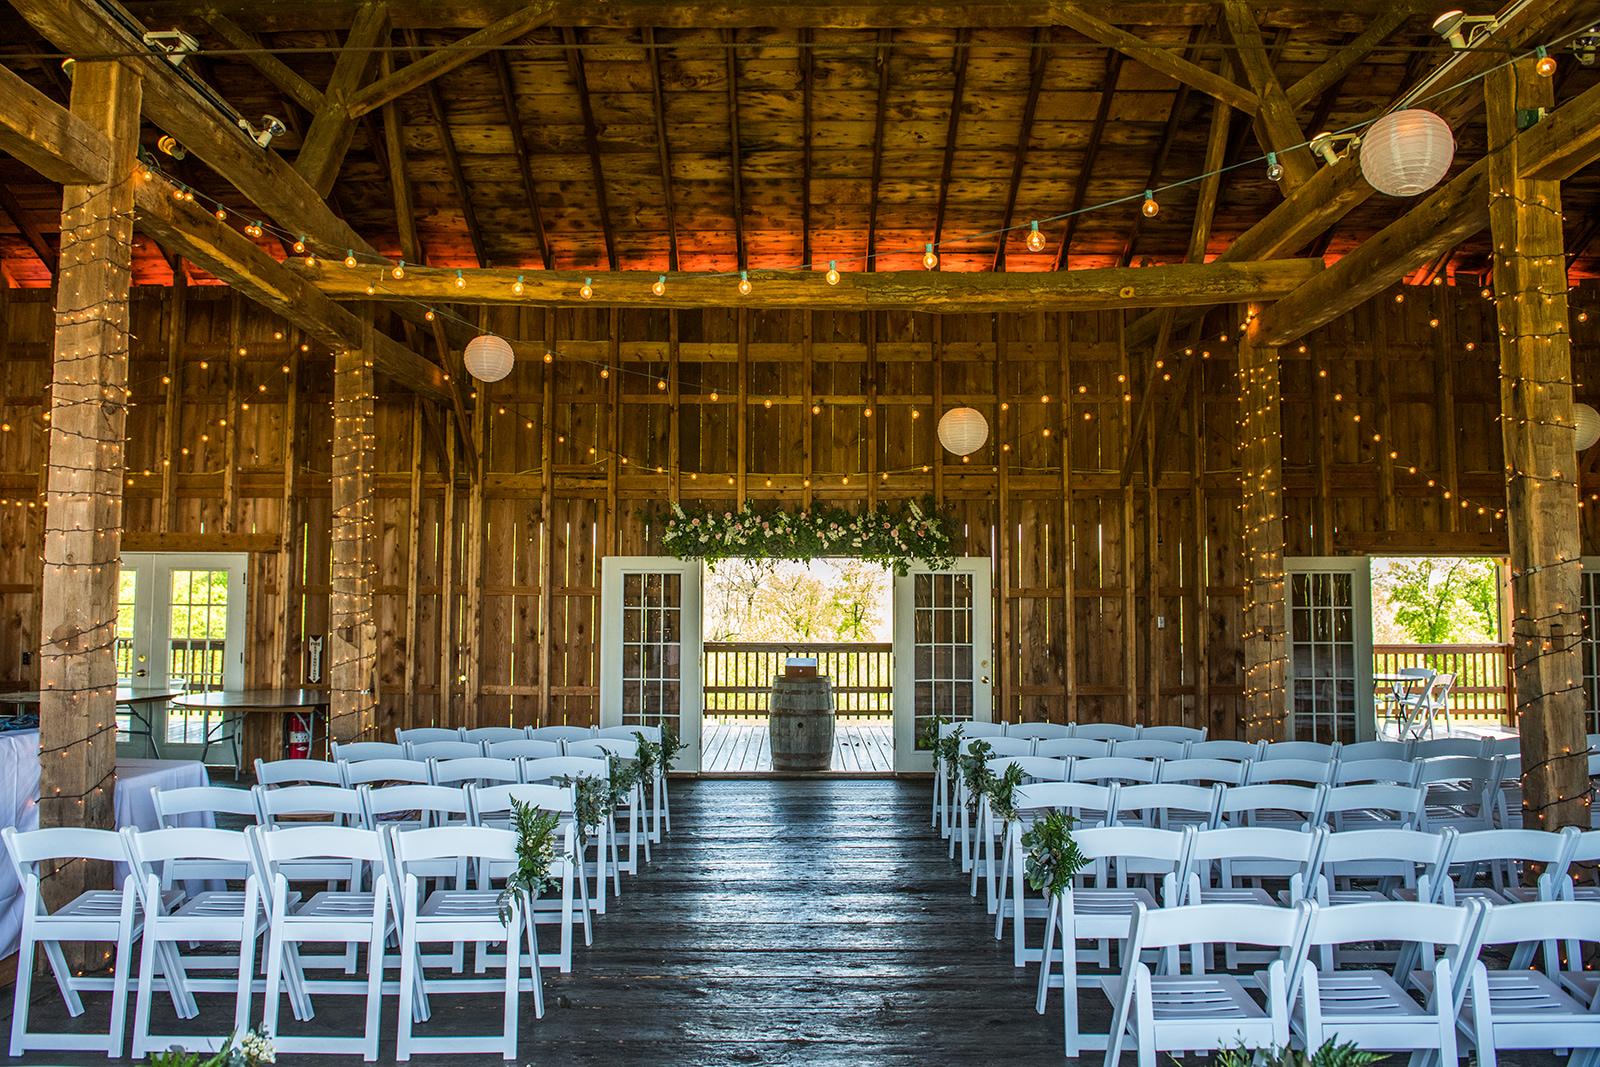 Armstrong Farms Rustic Barn Wedding Ceremony_Krystal Healy Photography.jpg